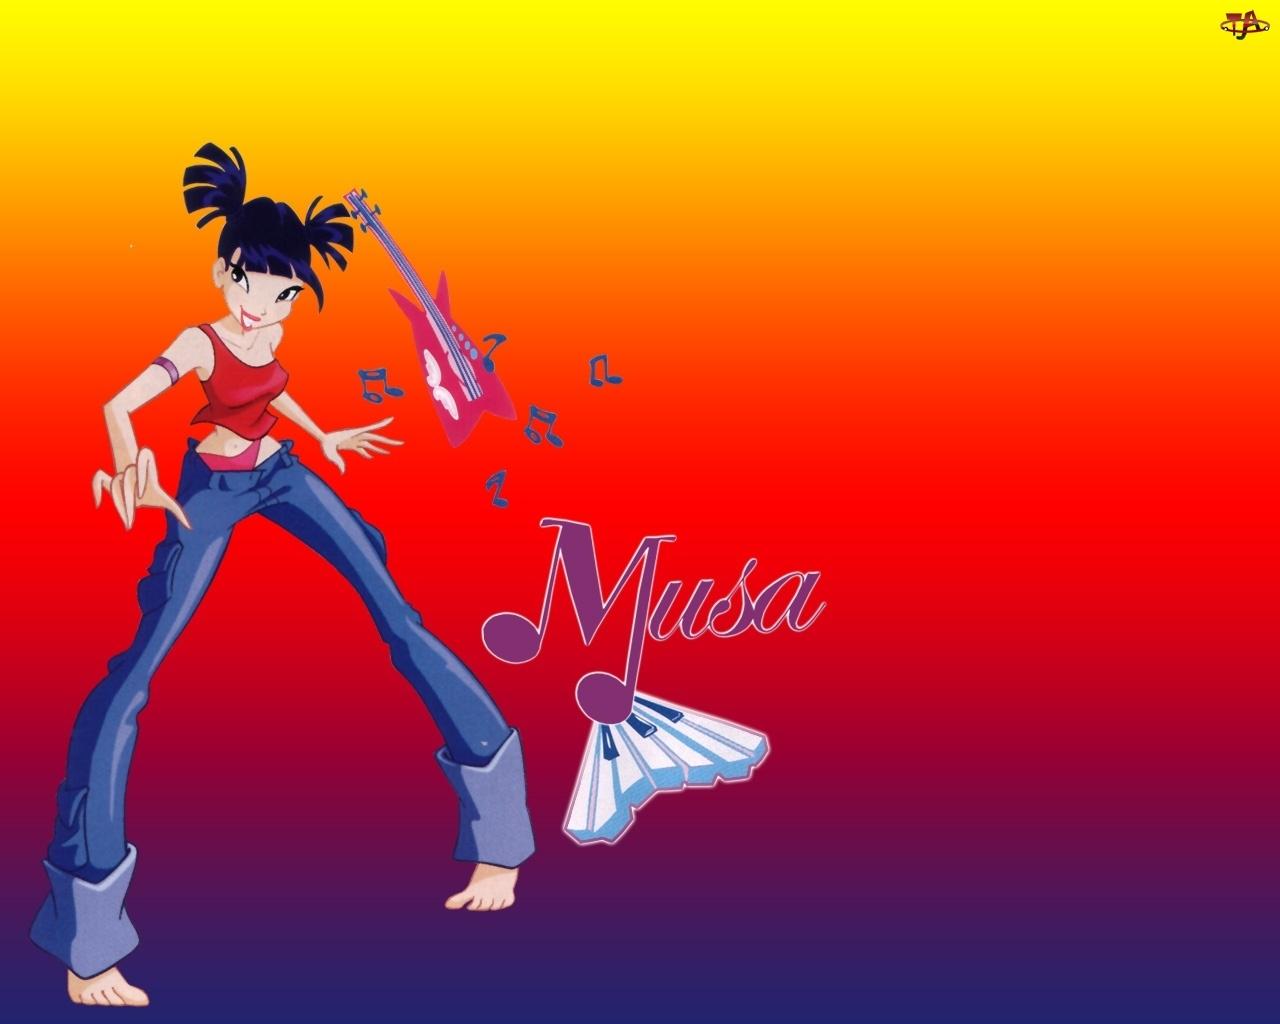 Nutka, Winx Club, Musa